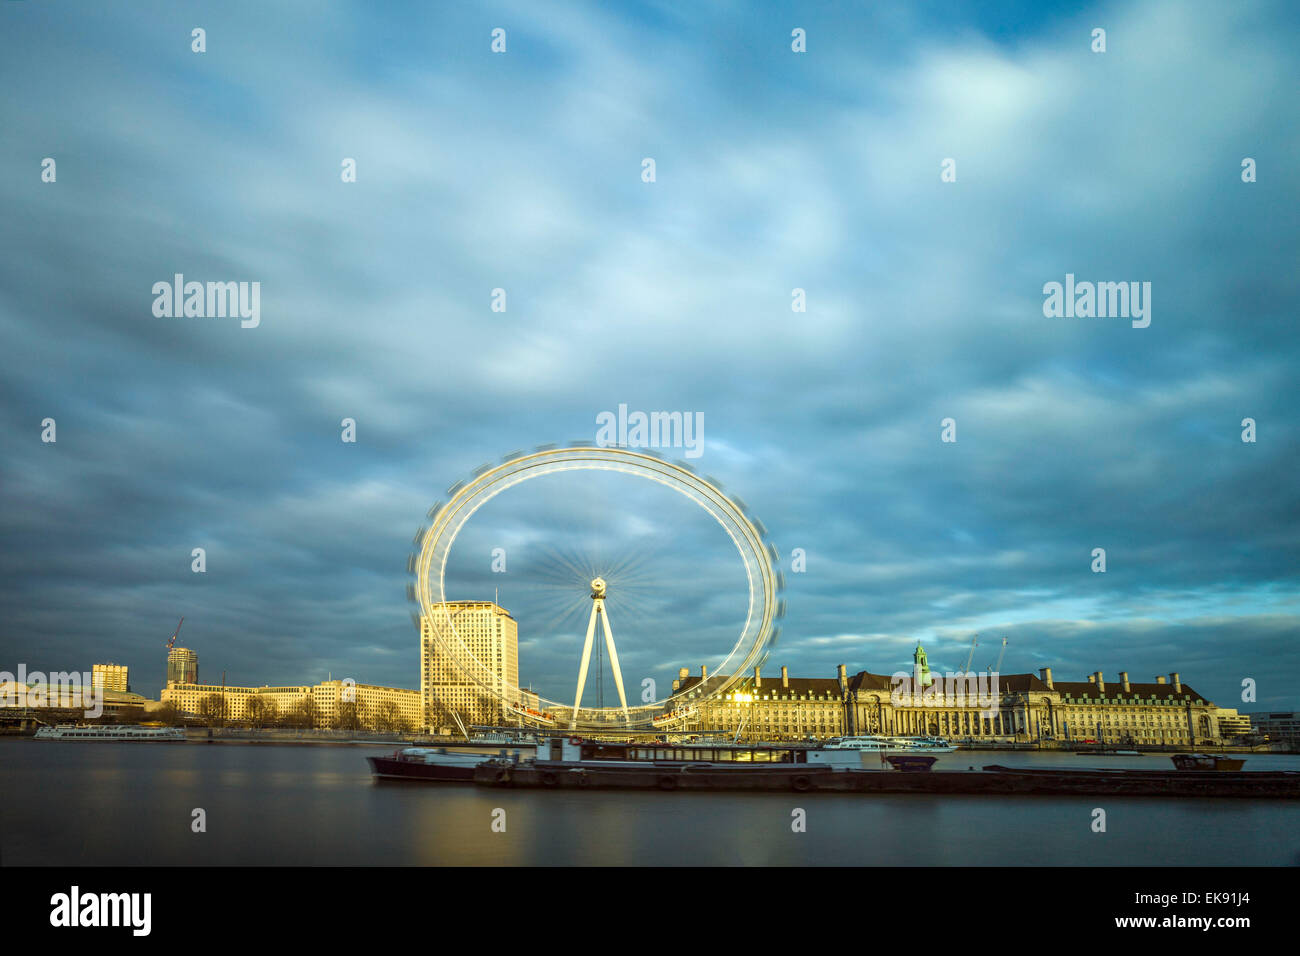 London eye durante la noche Foto de stock